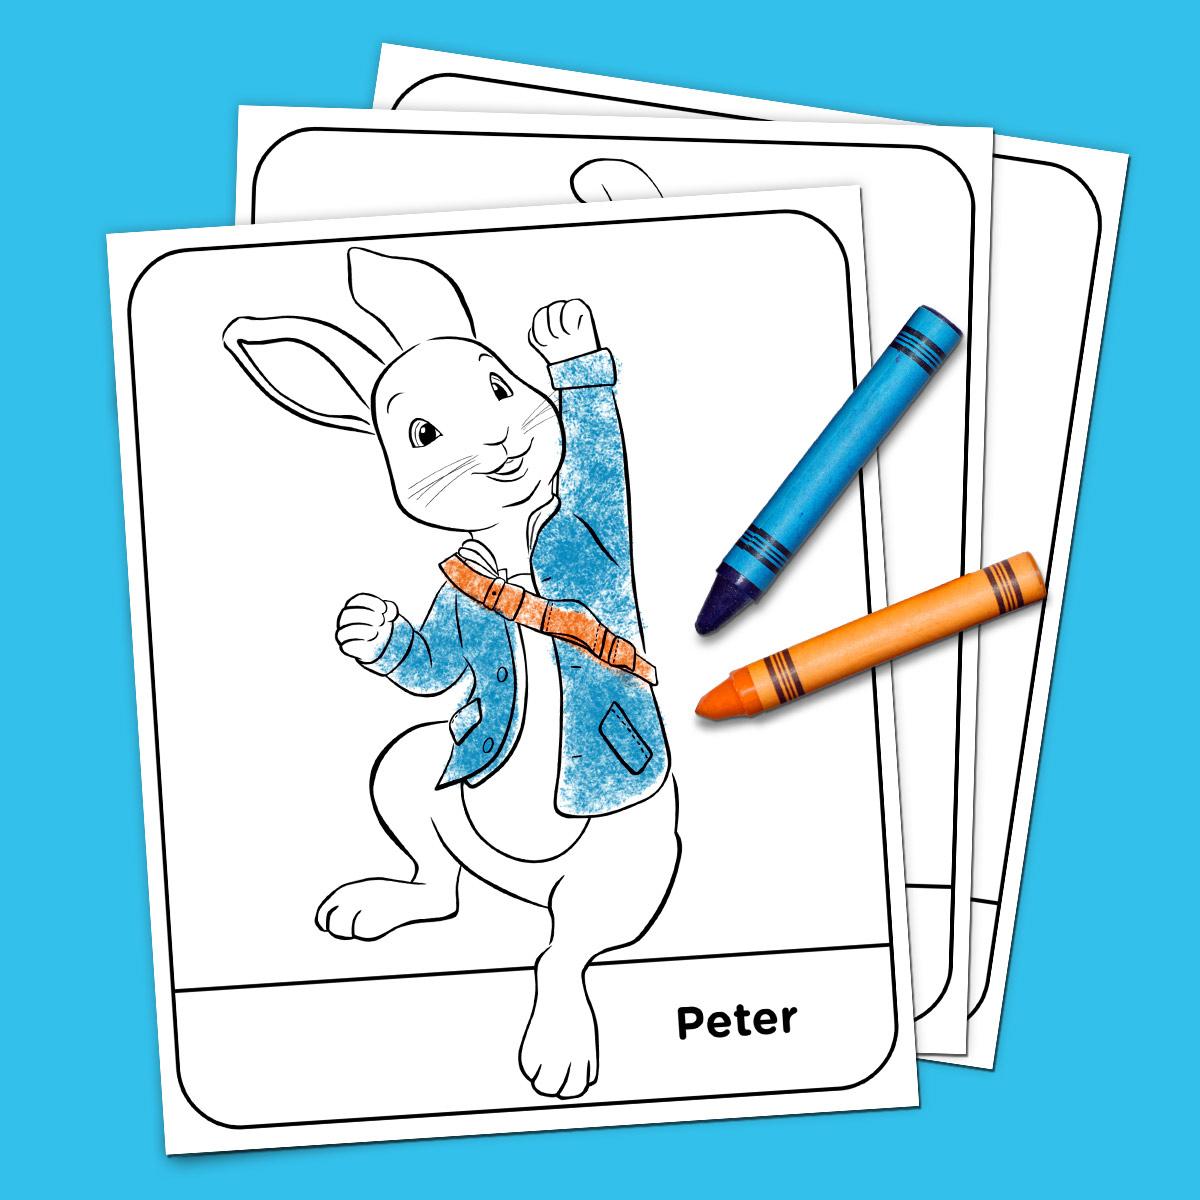 Peter Rabbit Coloring Pack | Nickelodeon Parents - Free Printable Peter Rabbit Coloring Pages